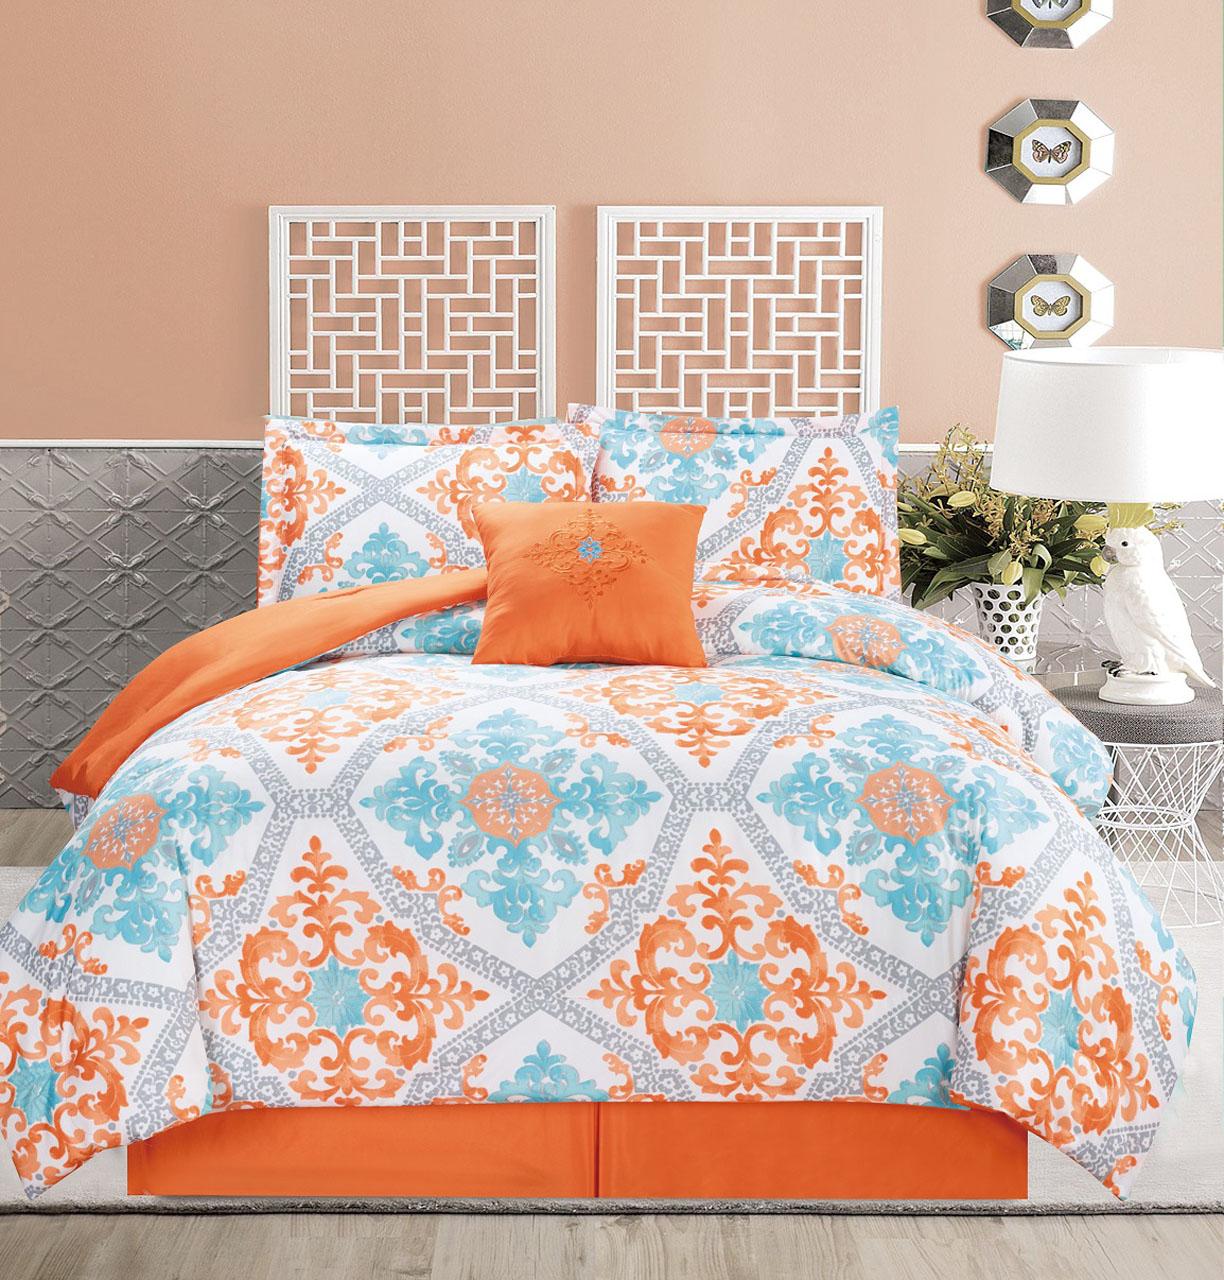 5 Piece Regal Orange Blue White Comforter Set Ebay